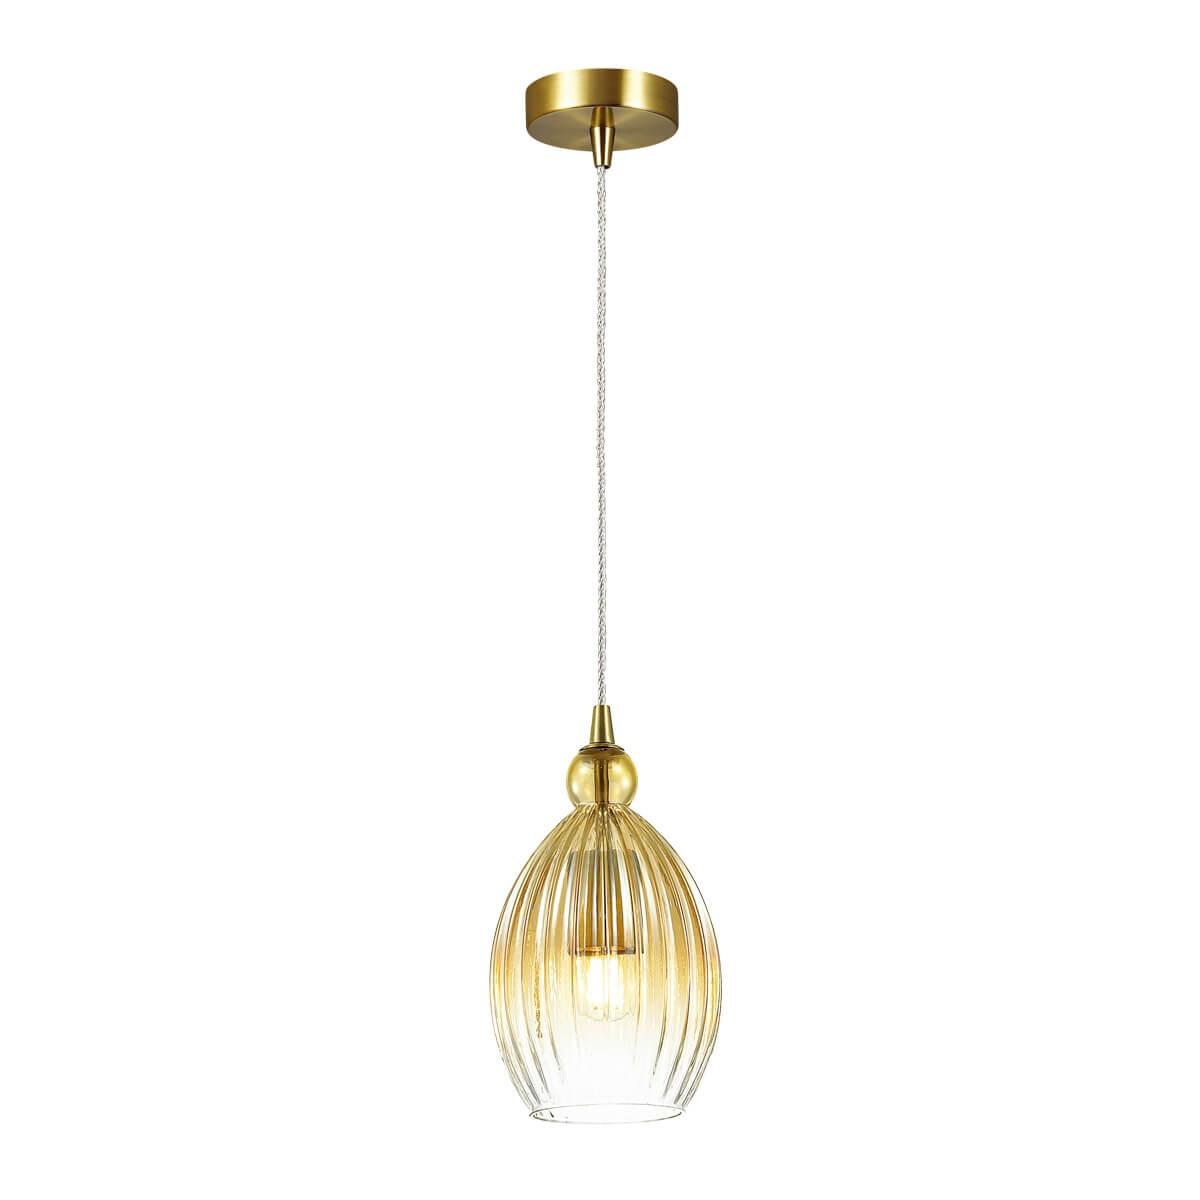 Светильник Odeon Light 4712/1 Pendant